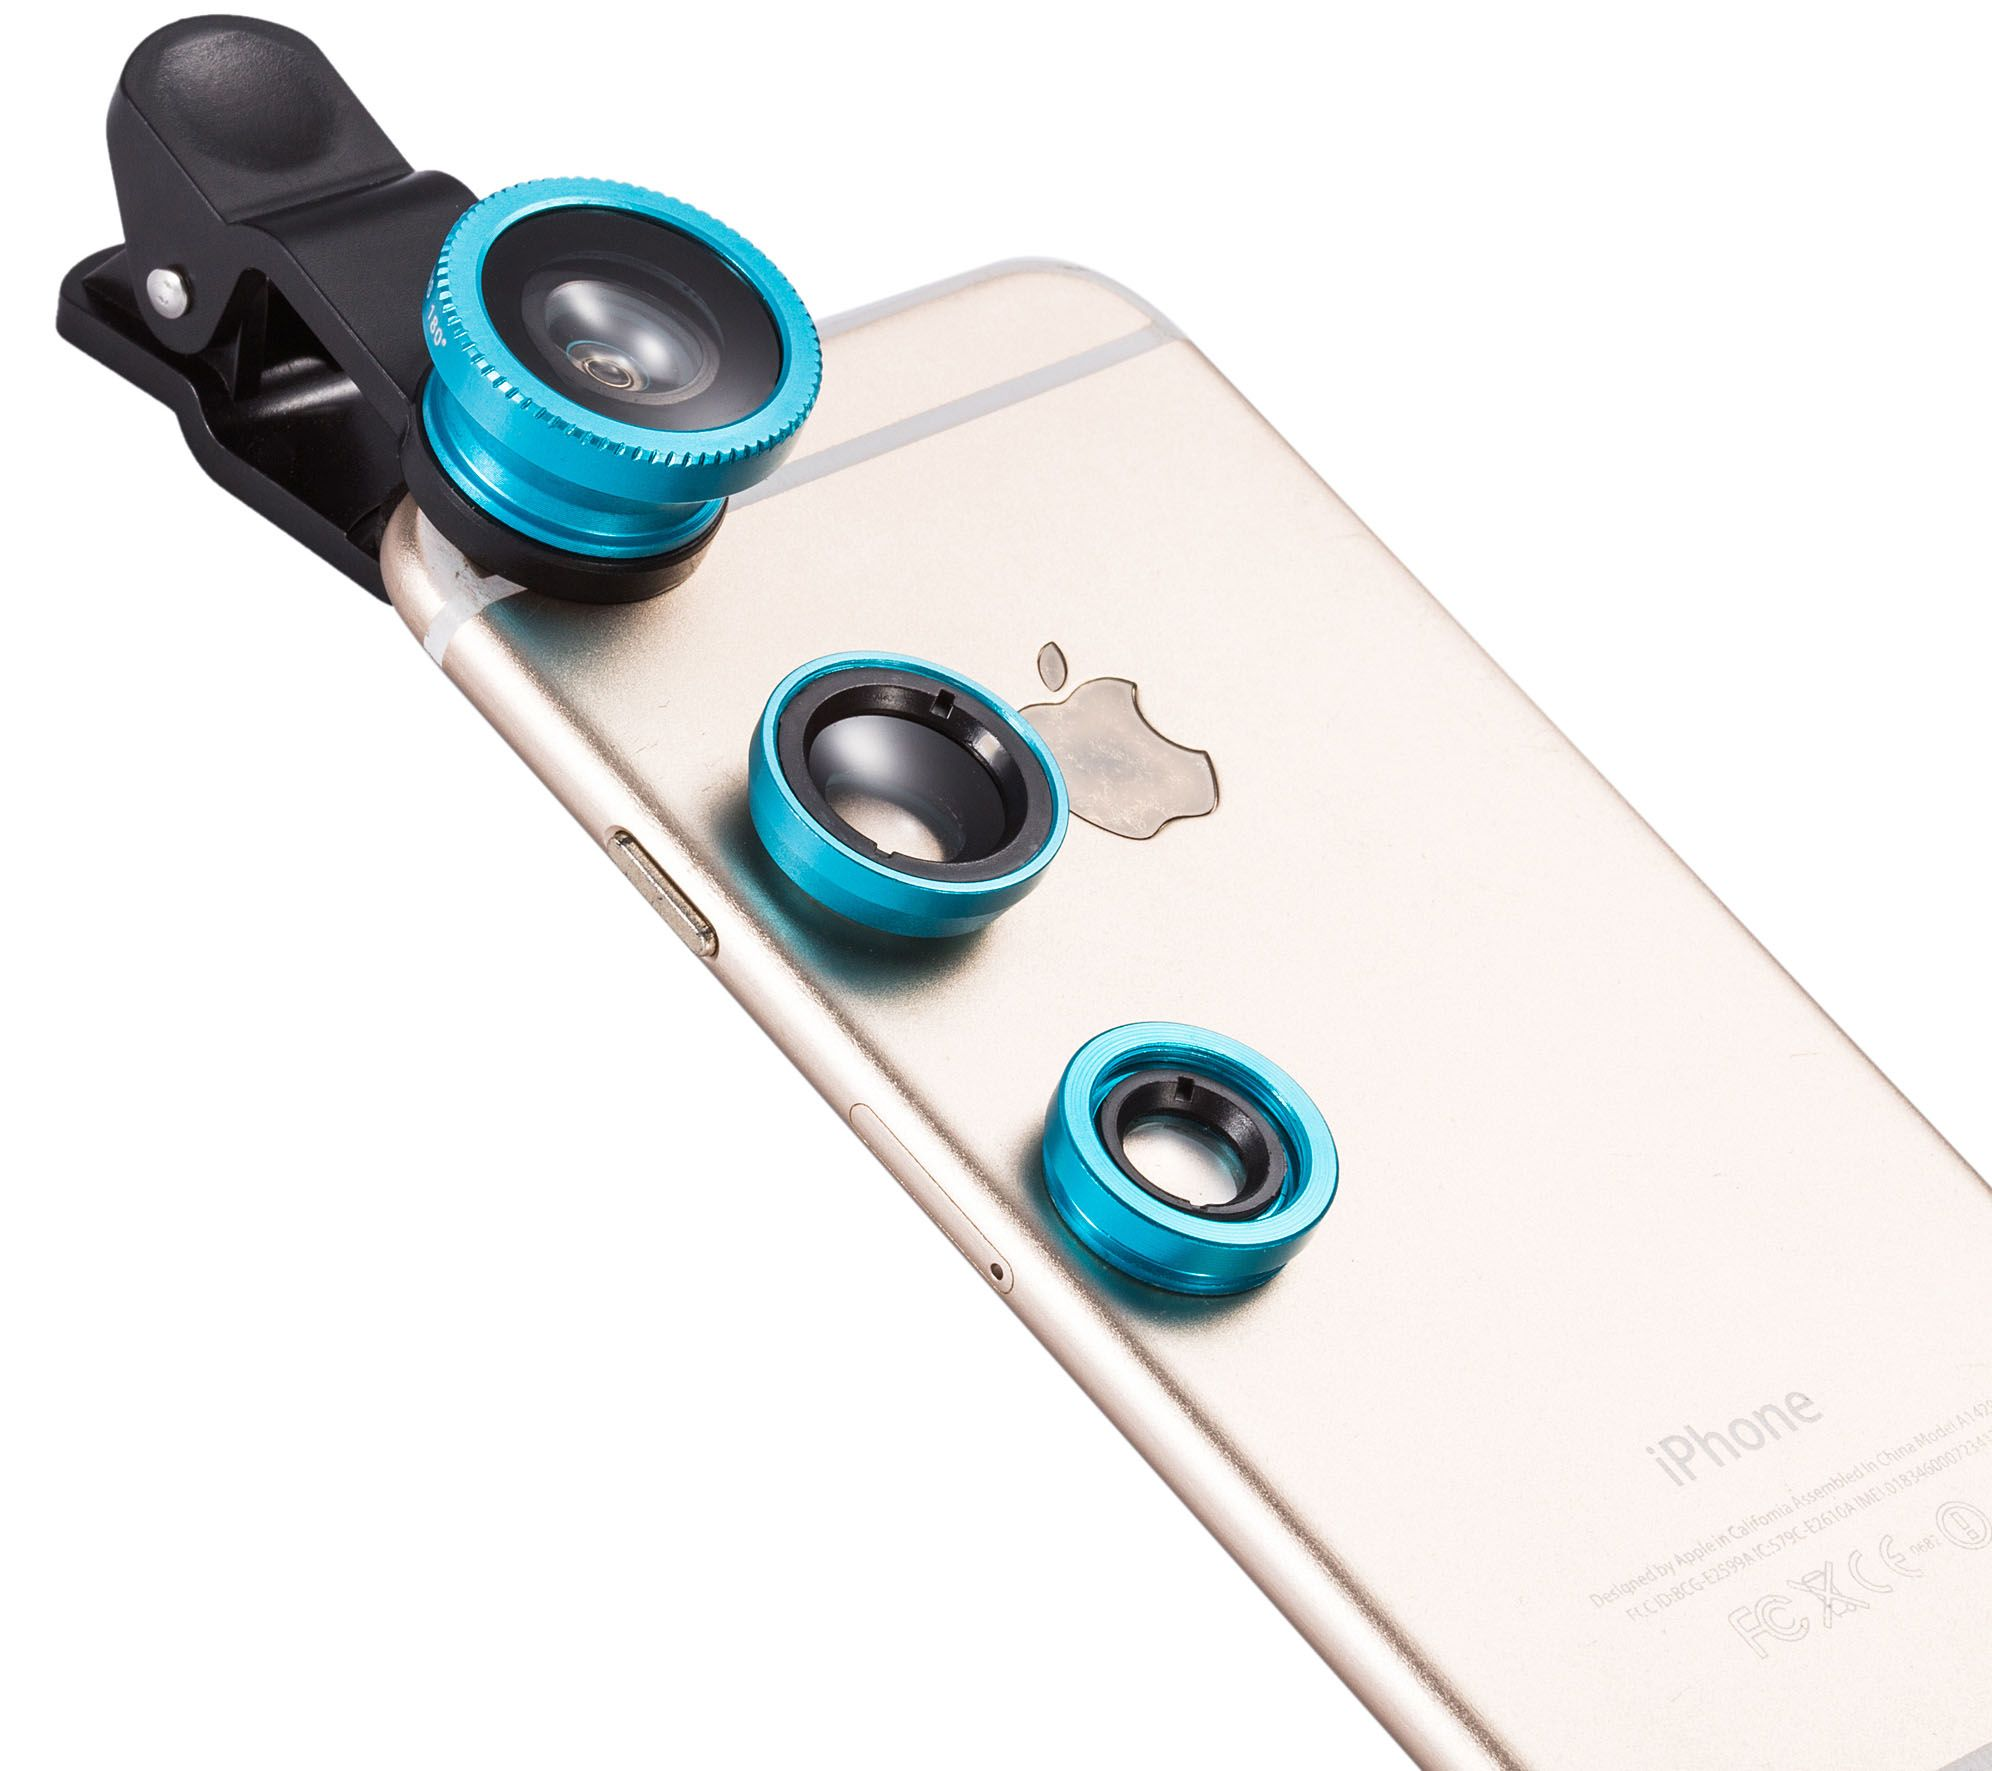 Poser Snap Pro 6piece Mobile Photo Amp Video Studio Kit With Tripod